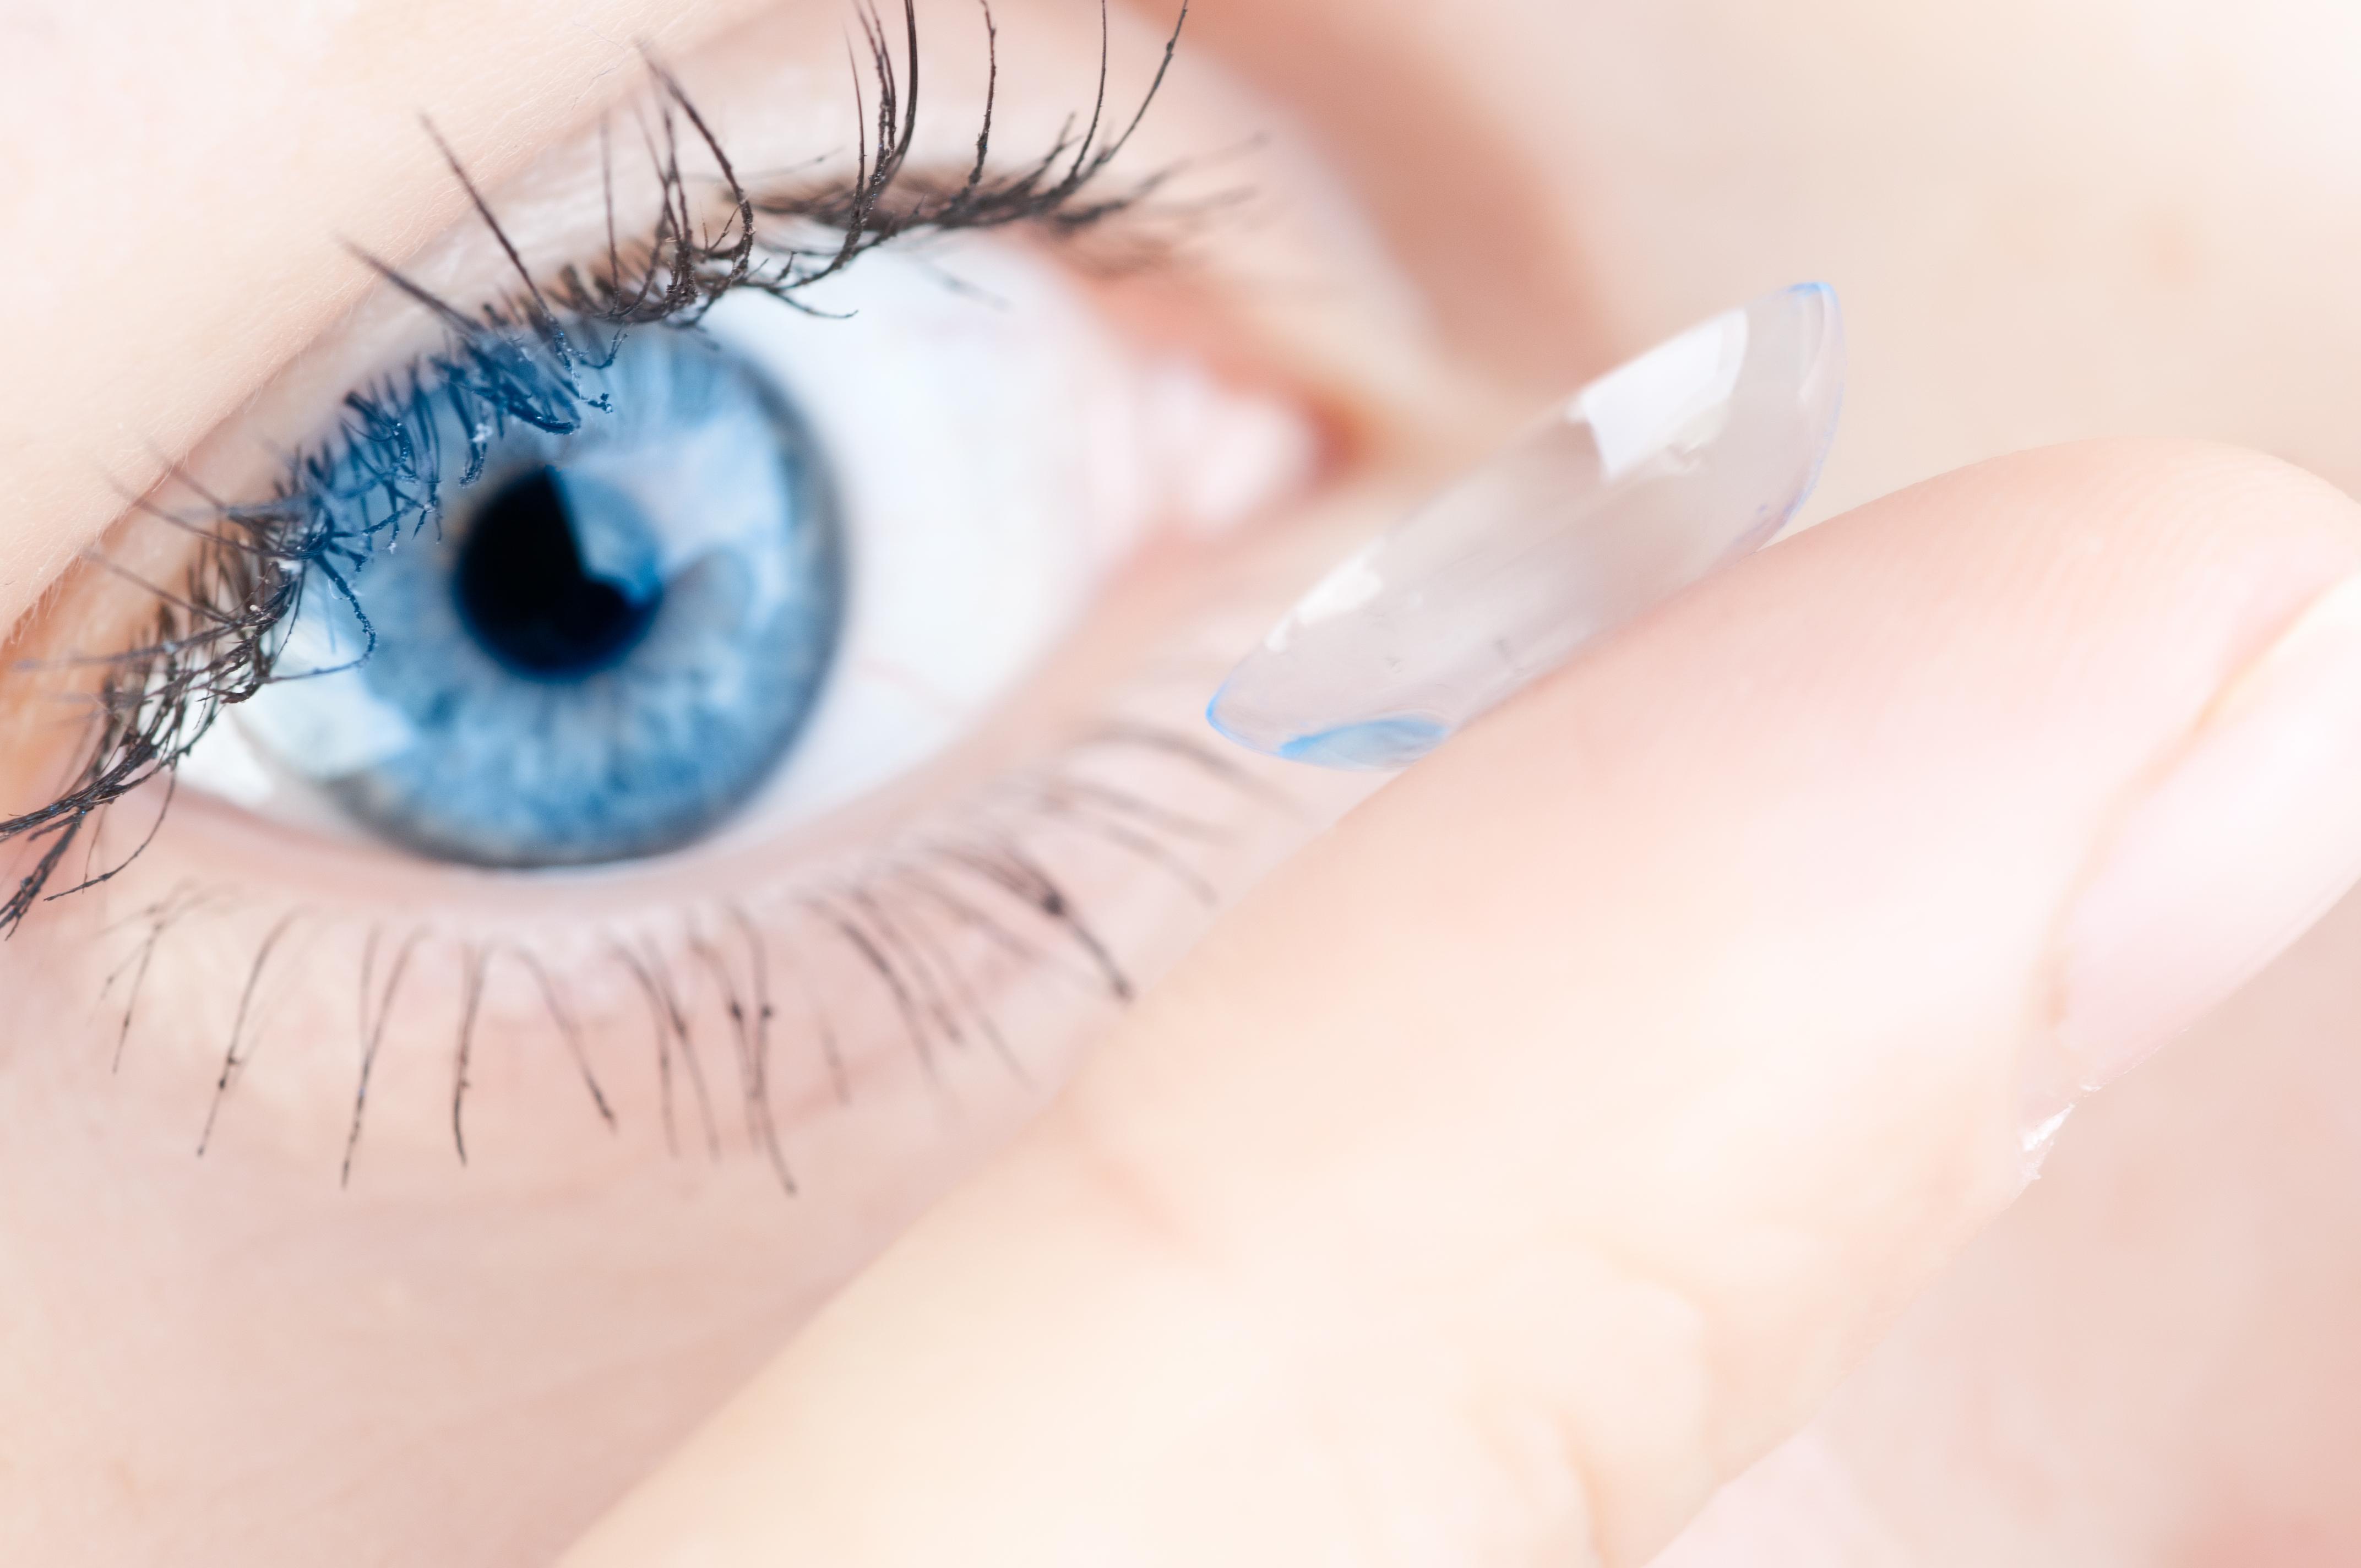 oko-soczewka